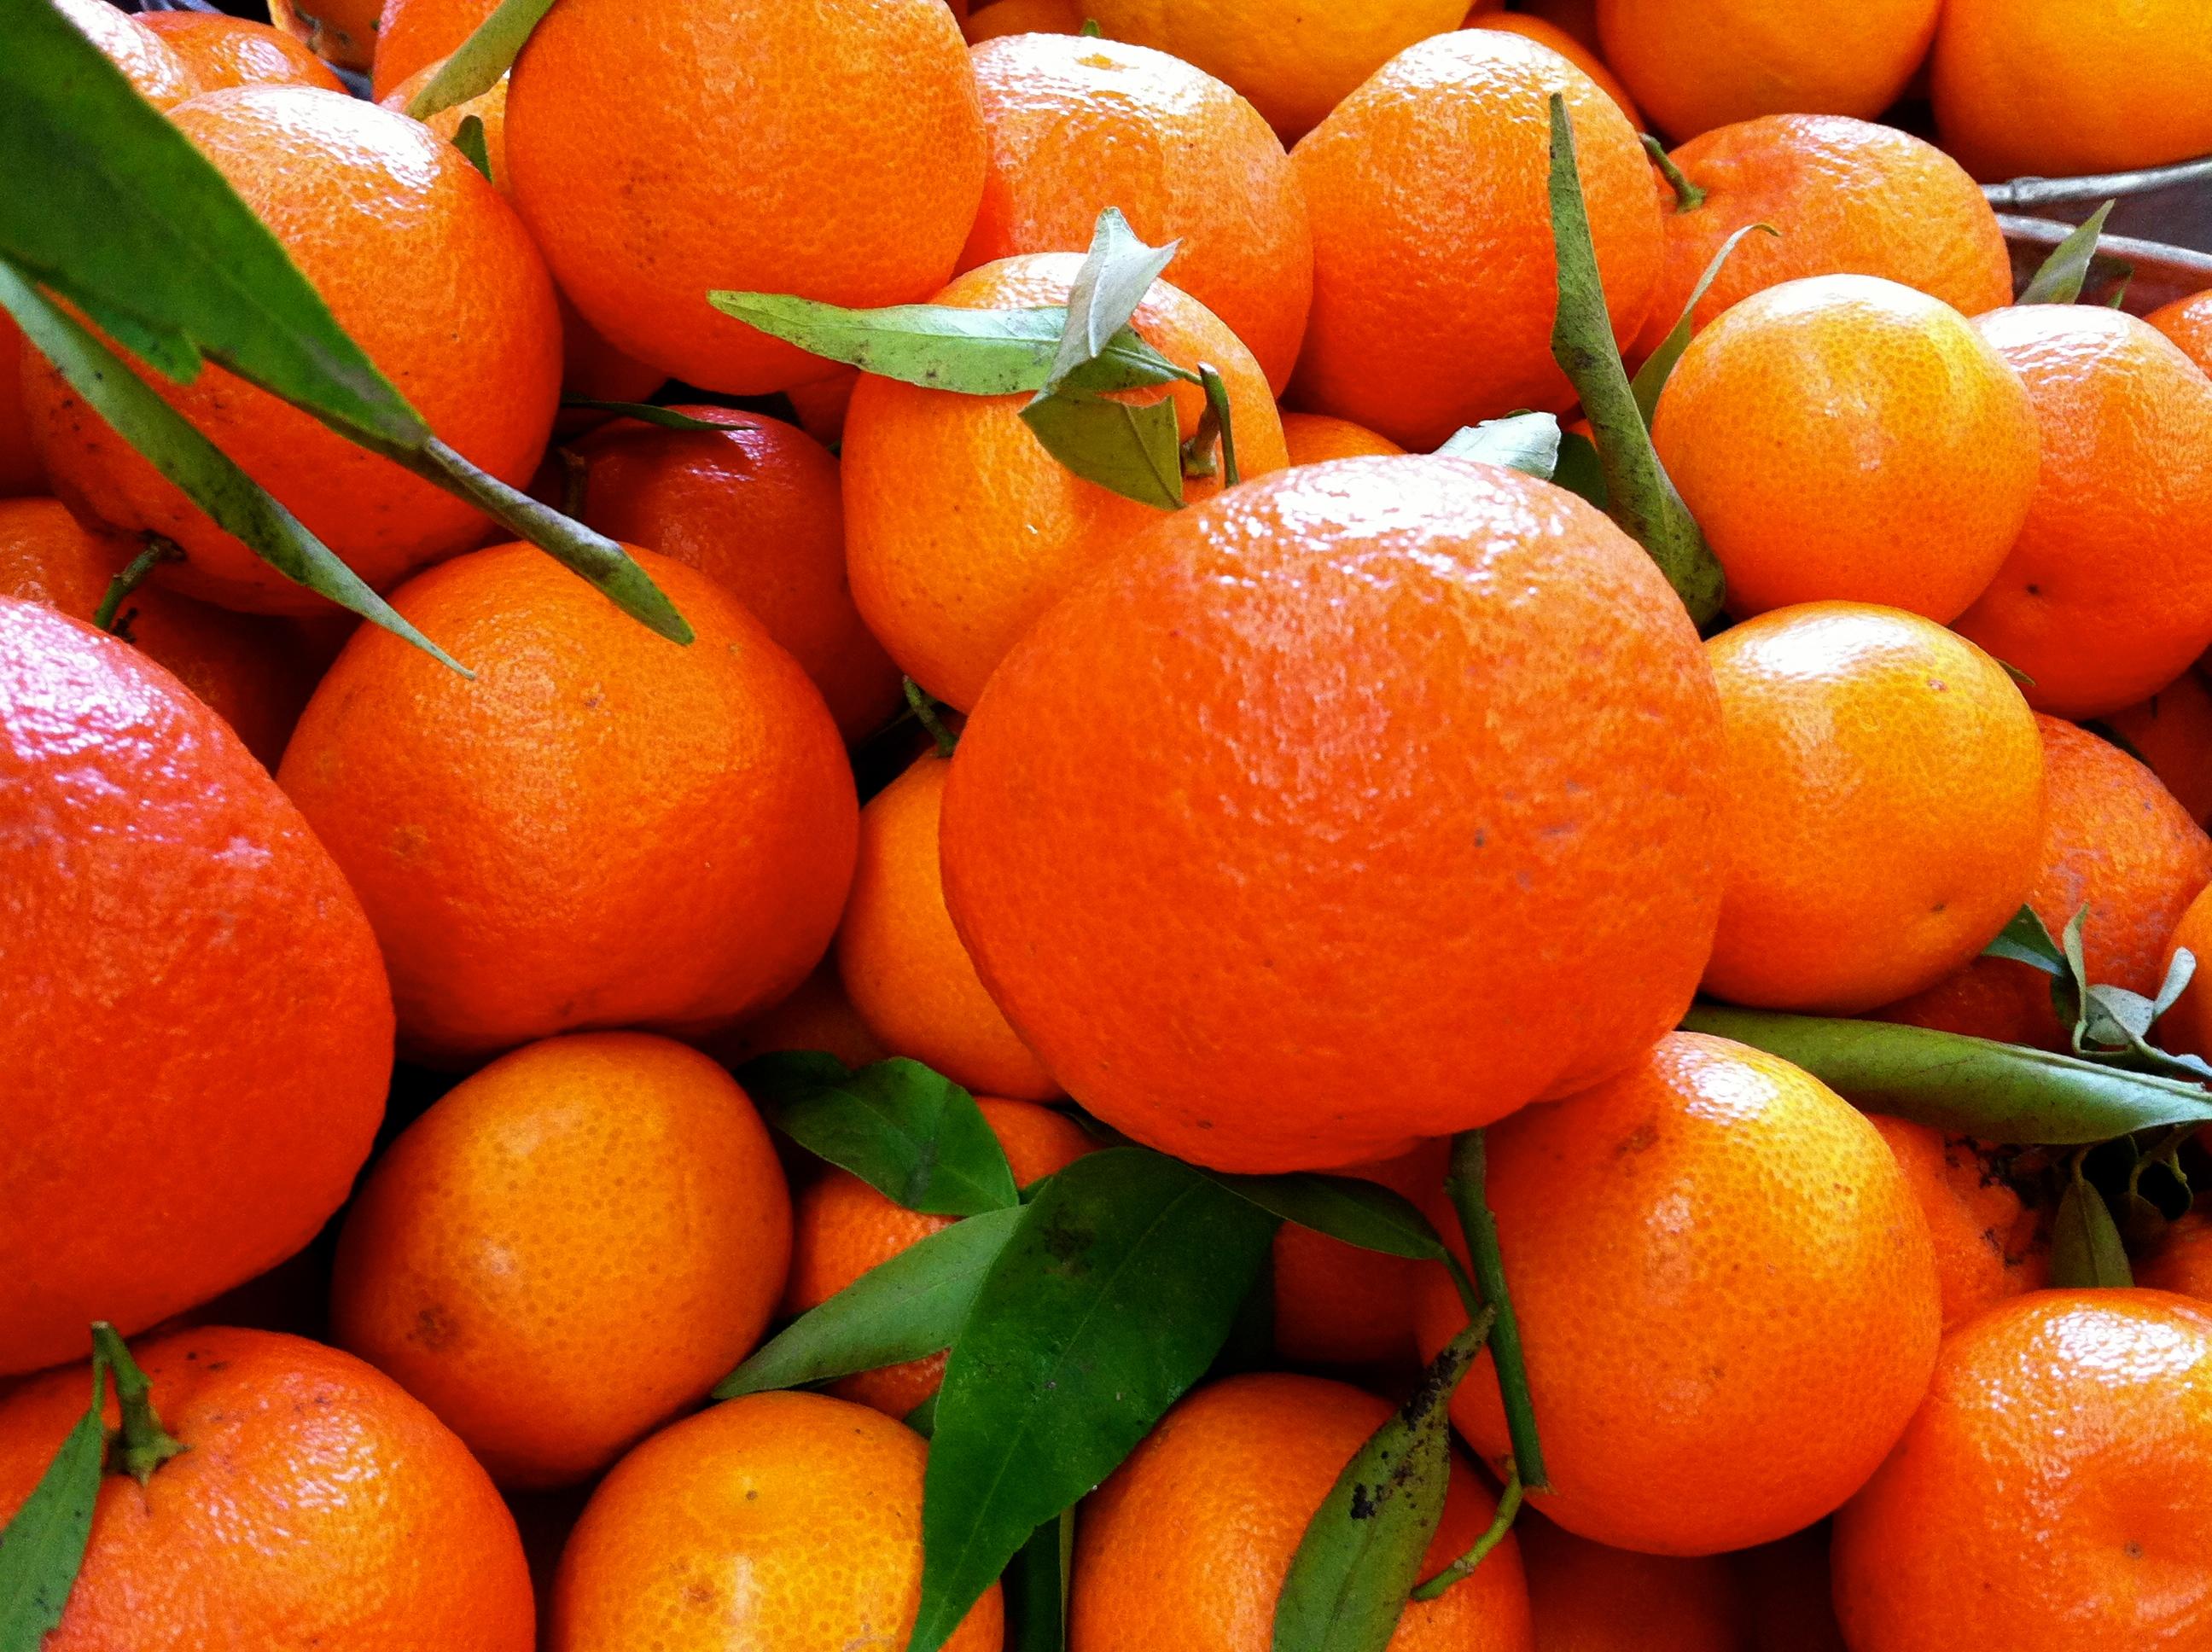 Tangerine barrel aged balsamic evoo marketplace colorado 39 s original olive oil aged balsamic - Mandarina home online ...